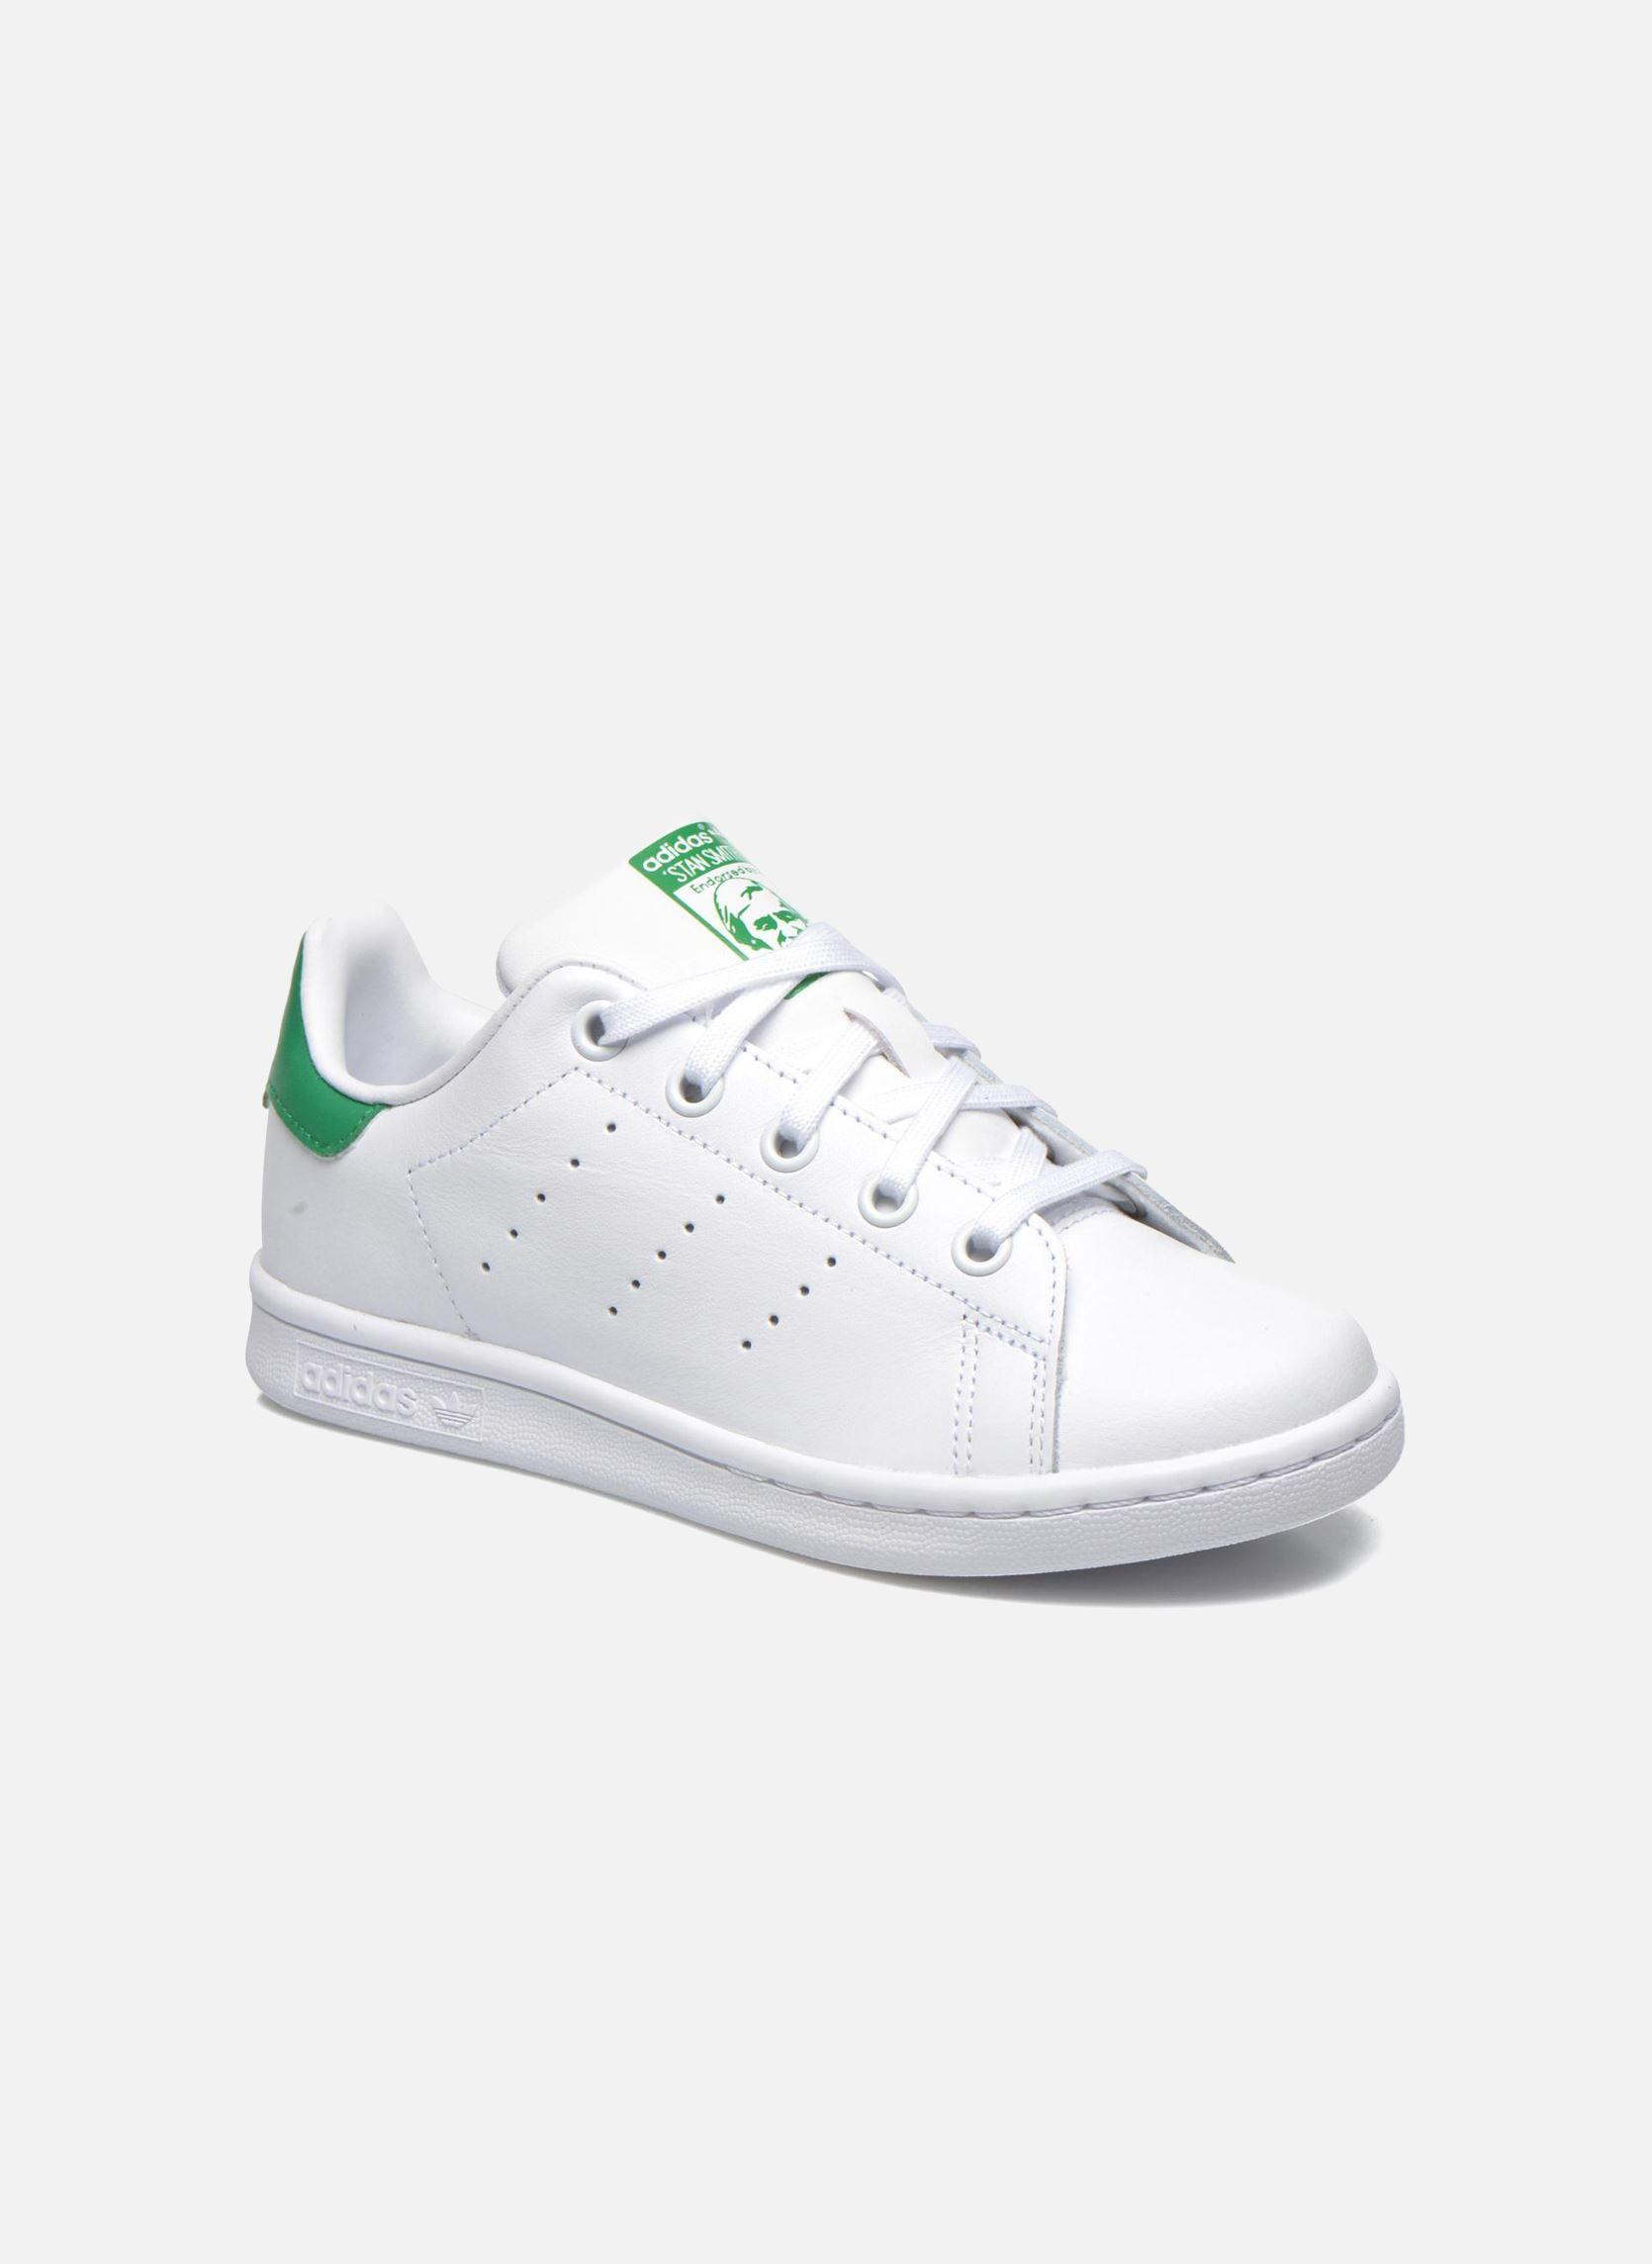 Attrayant Blanc Bleu Adidas Originals Chaussures Chaussures